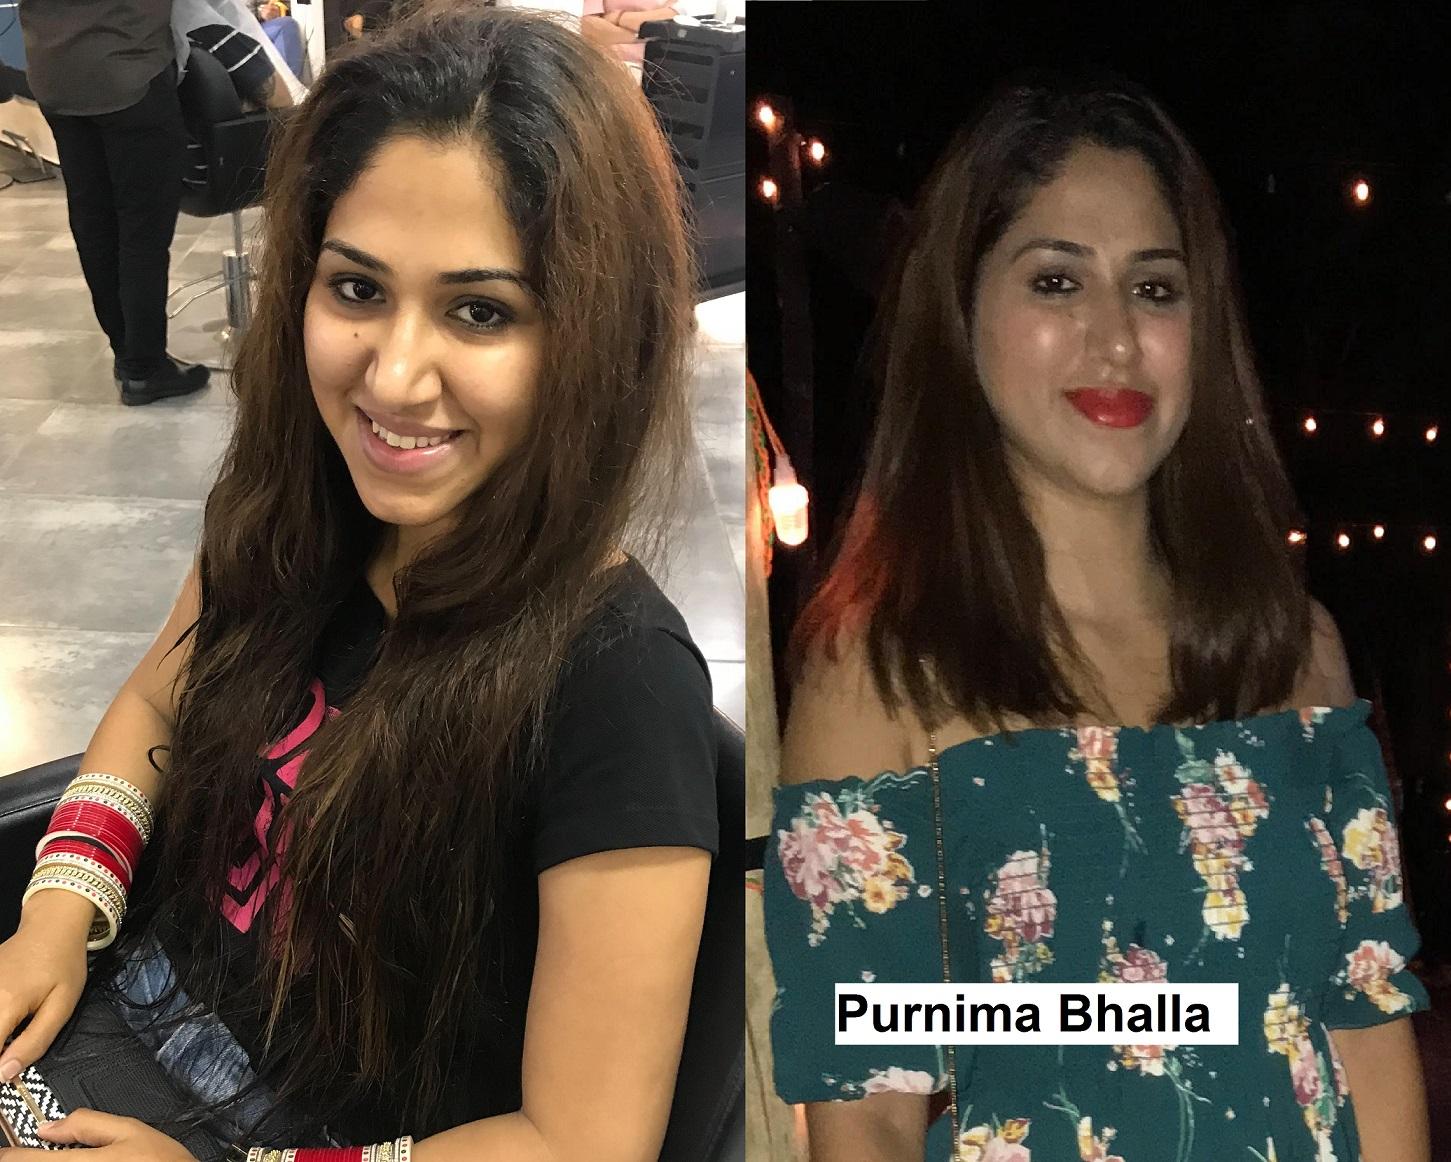 Purnima Bhalla